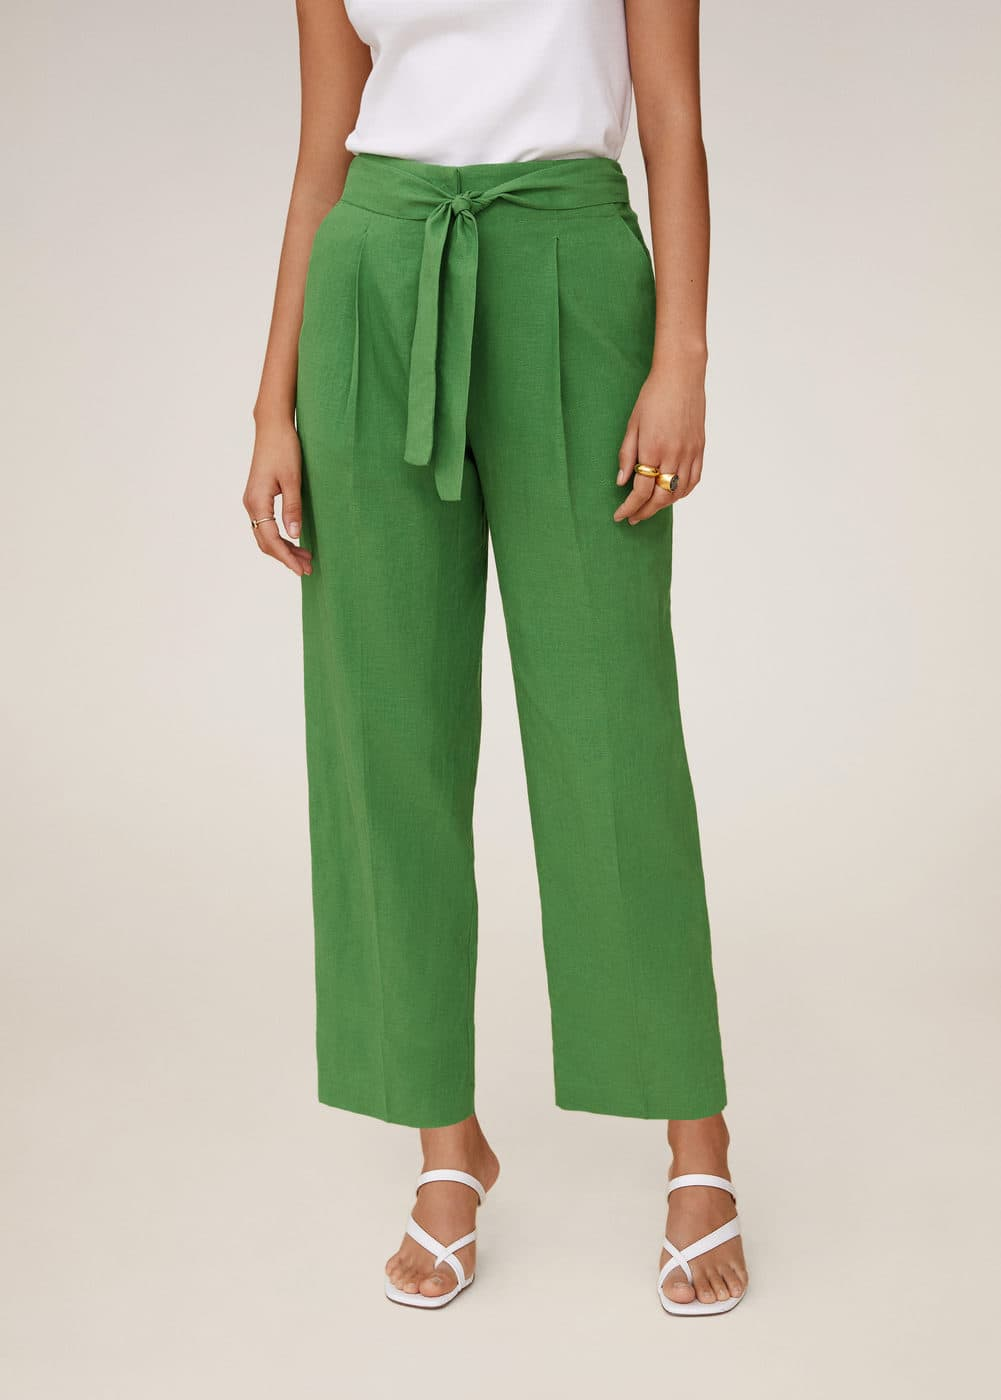 m-emma:pantalon crop lino